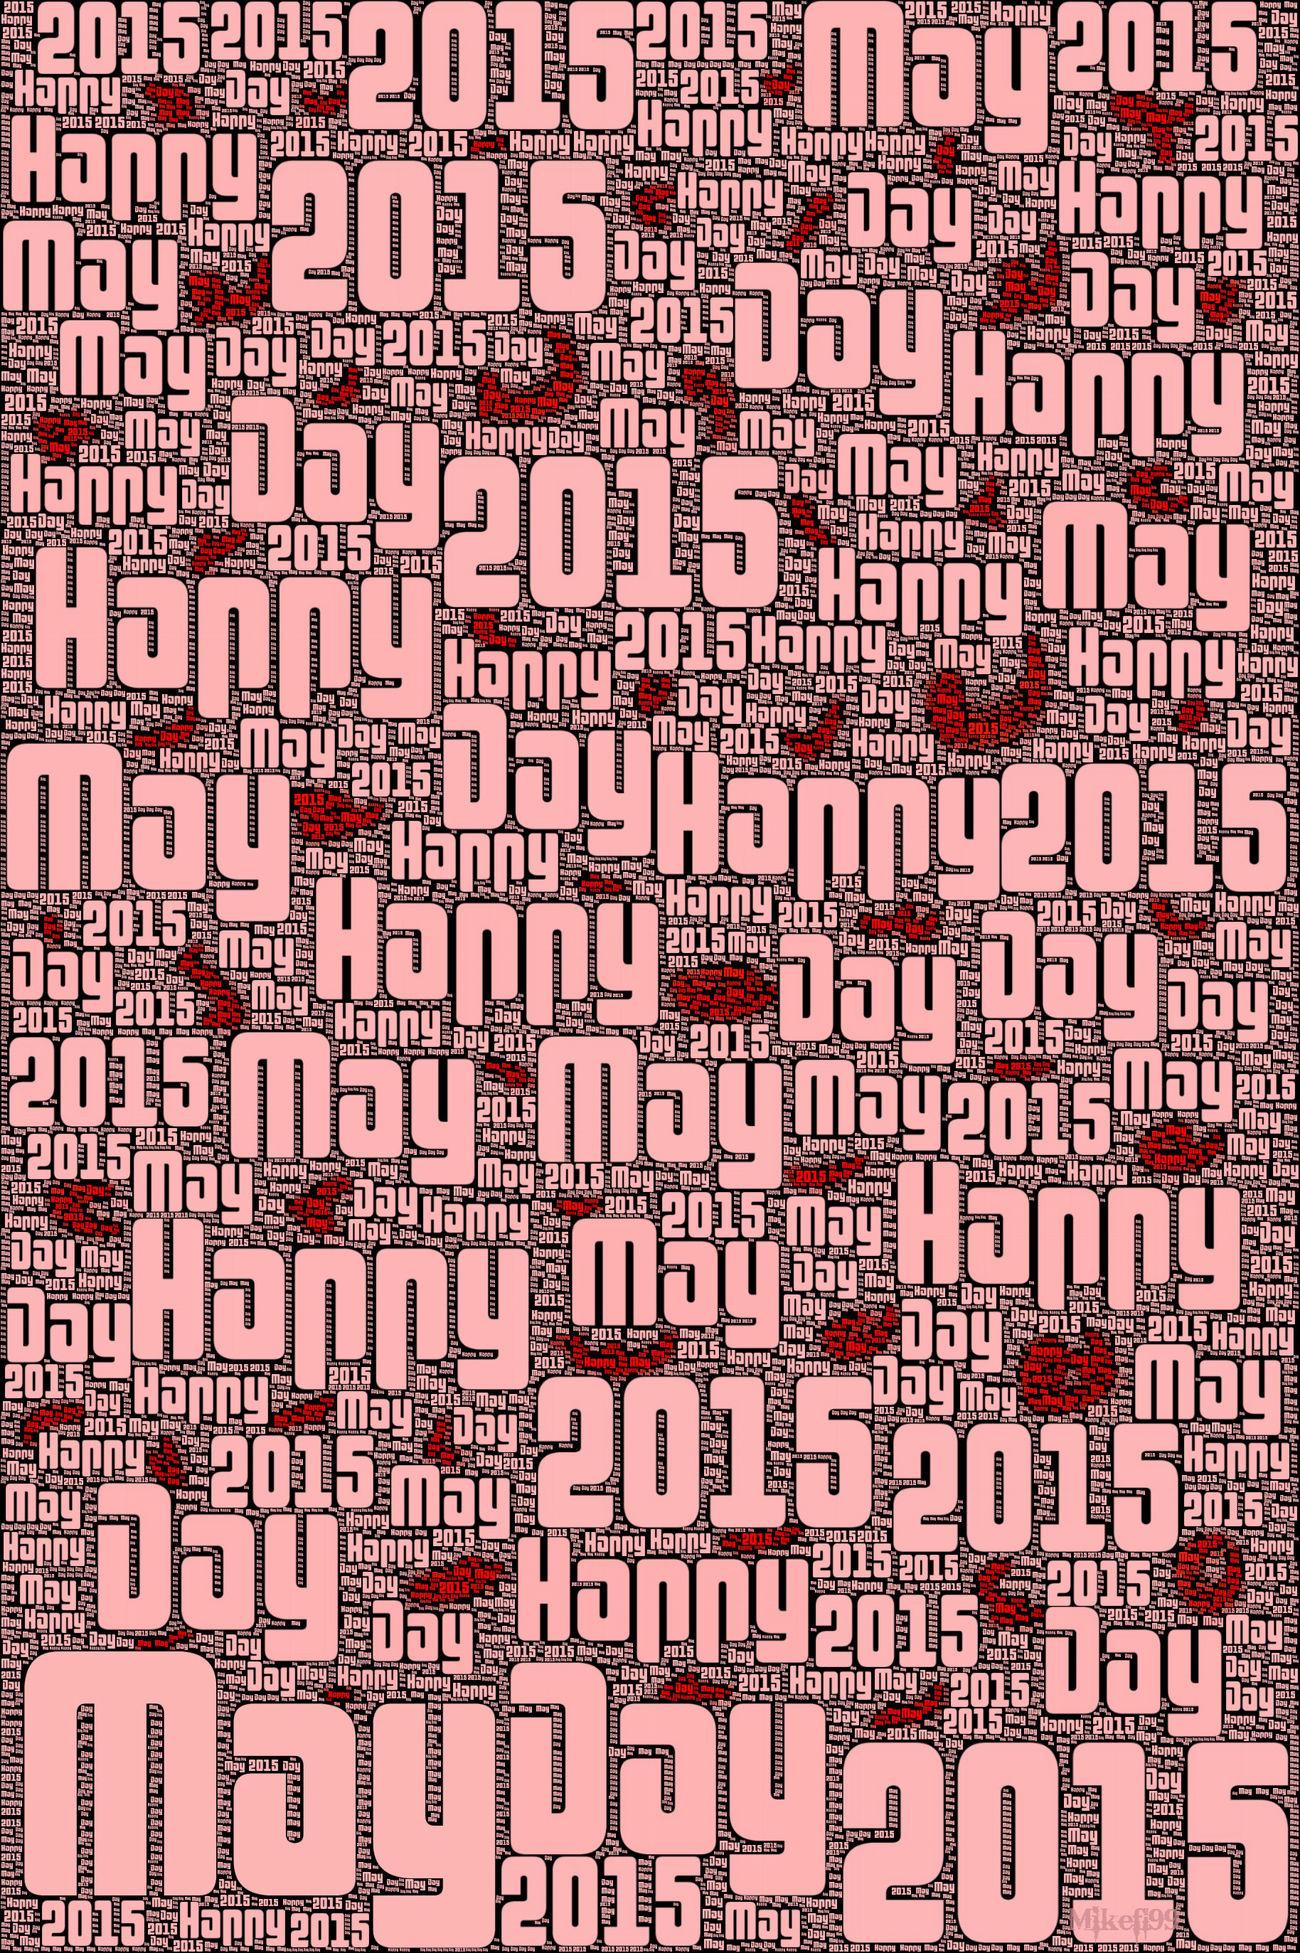 Happy May Day 2015 Mayday2015 ArtPop Modern Art Streamzoofamily Mikefl99 Digital Art Warhol Inspired Red Red Red!!! Modernartwork Creative